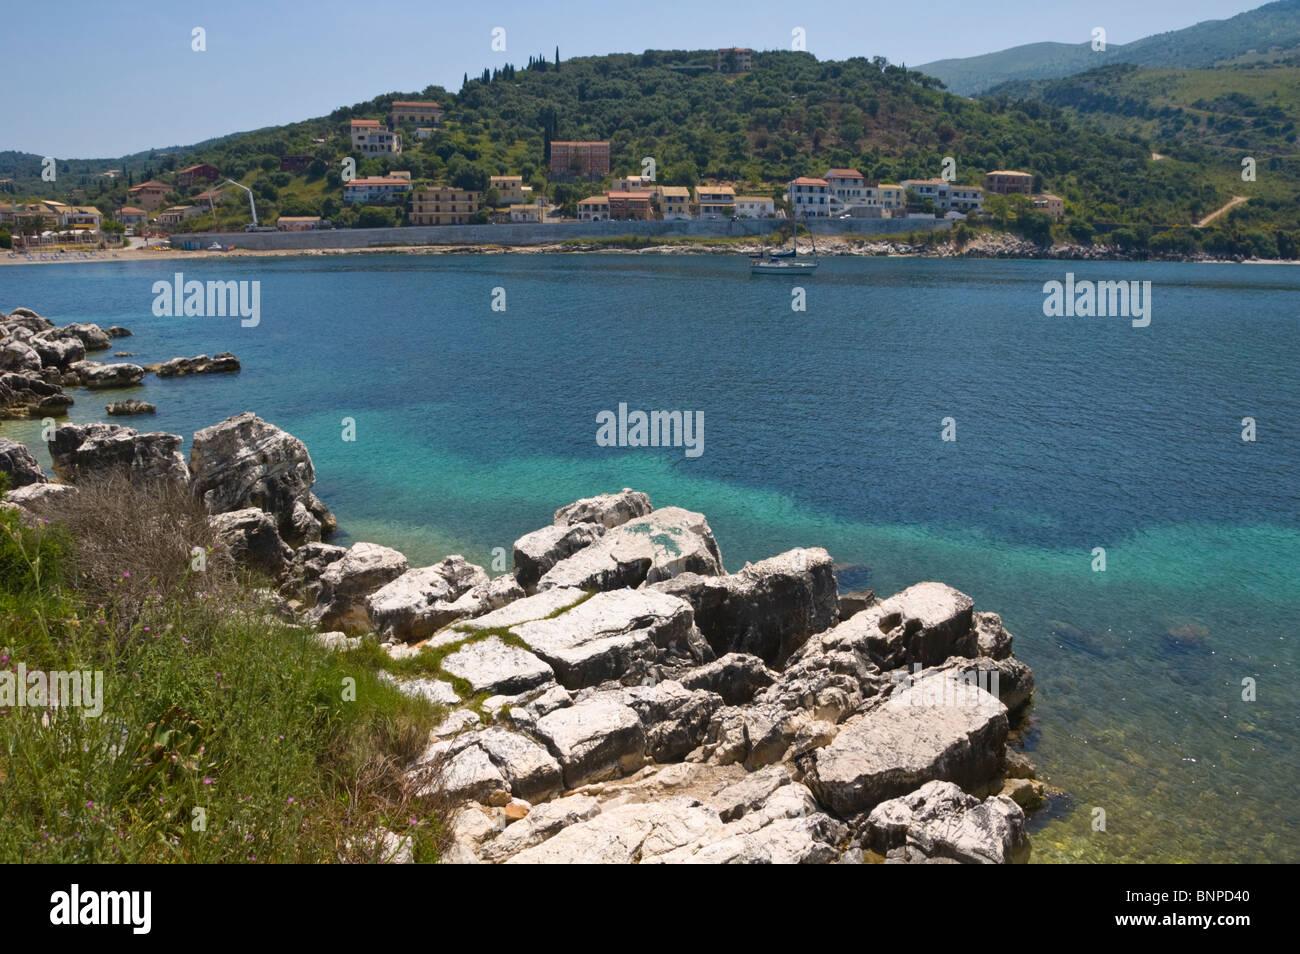 Rocky coastline at Kassiopi on the Greek Mediterranean island of Corfu Greece GR Stock Photo